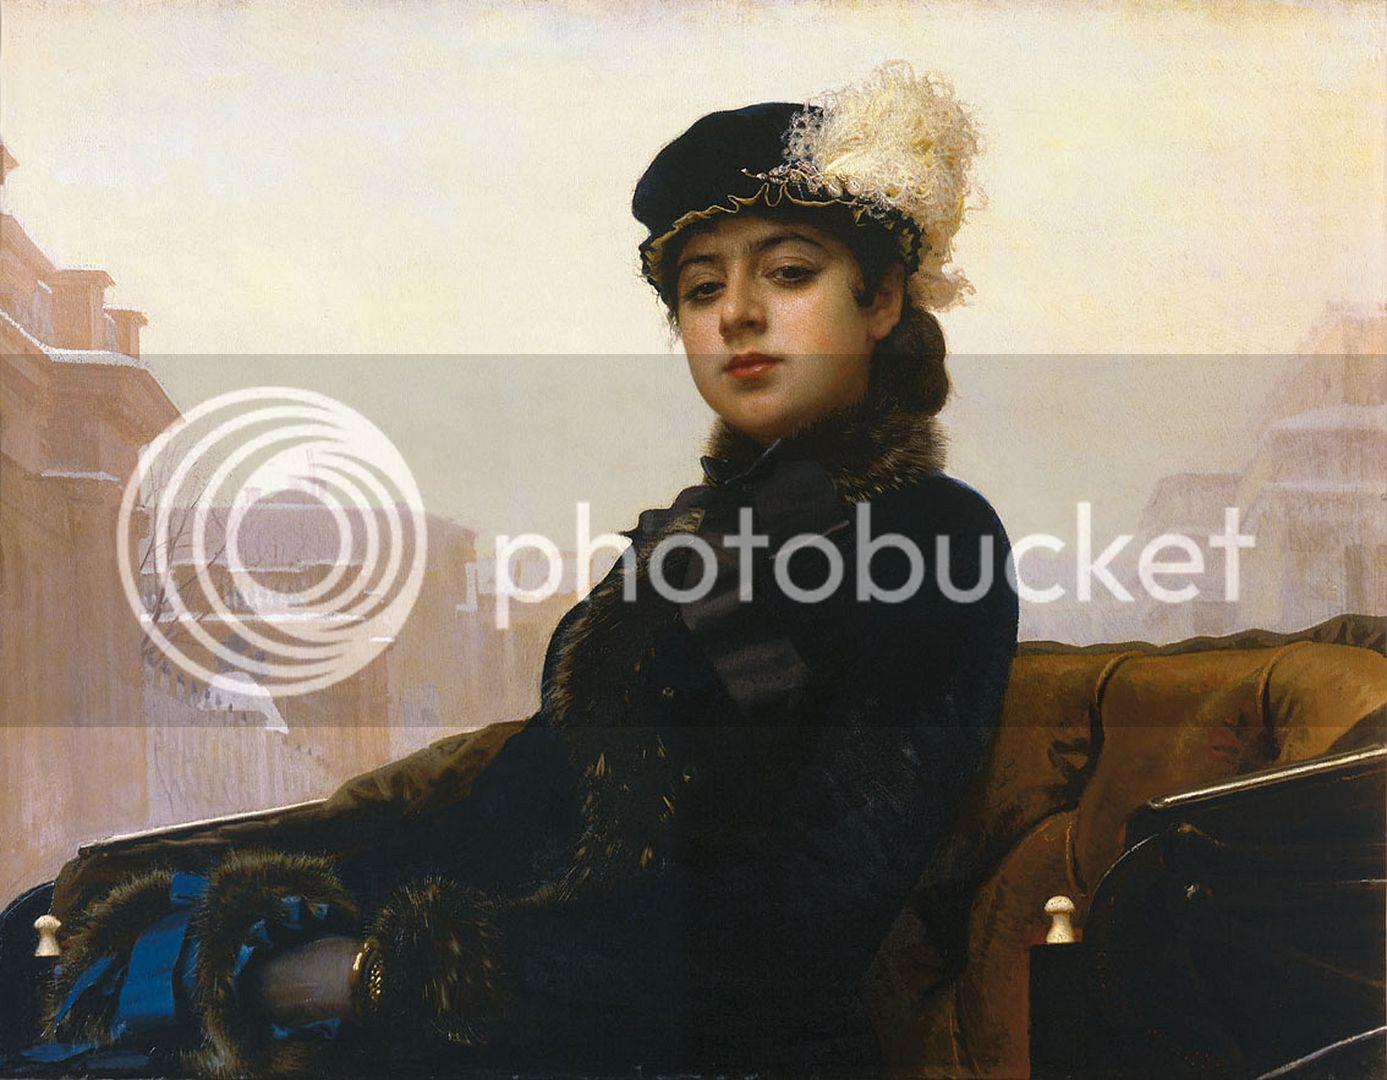 RETRATO DE UNA DESCONOCIDA DE IVÁN KRASKOI Kramskoy_Portrait_of_a_Woman_zps0119613c